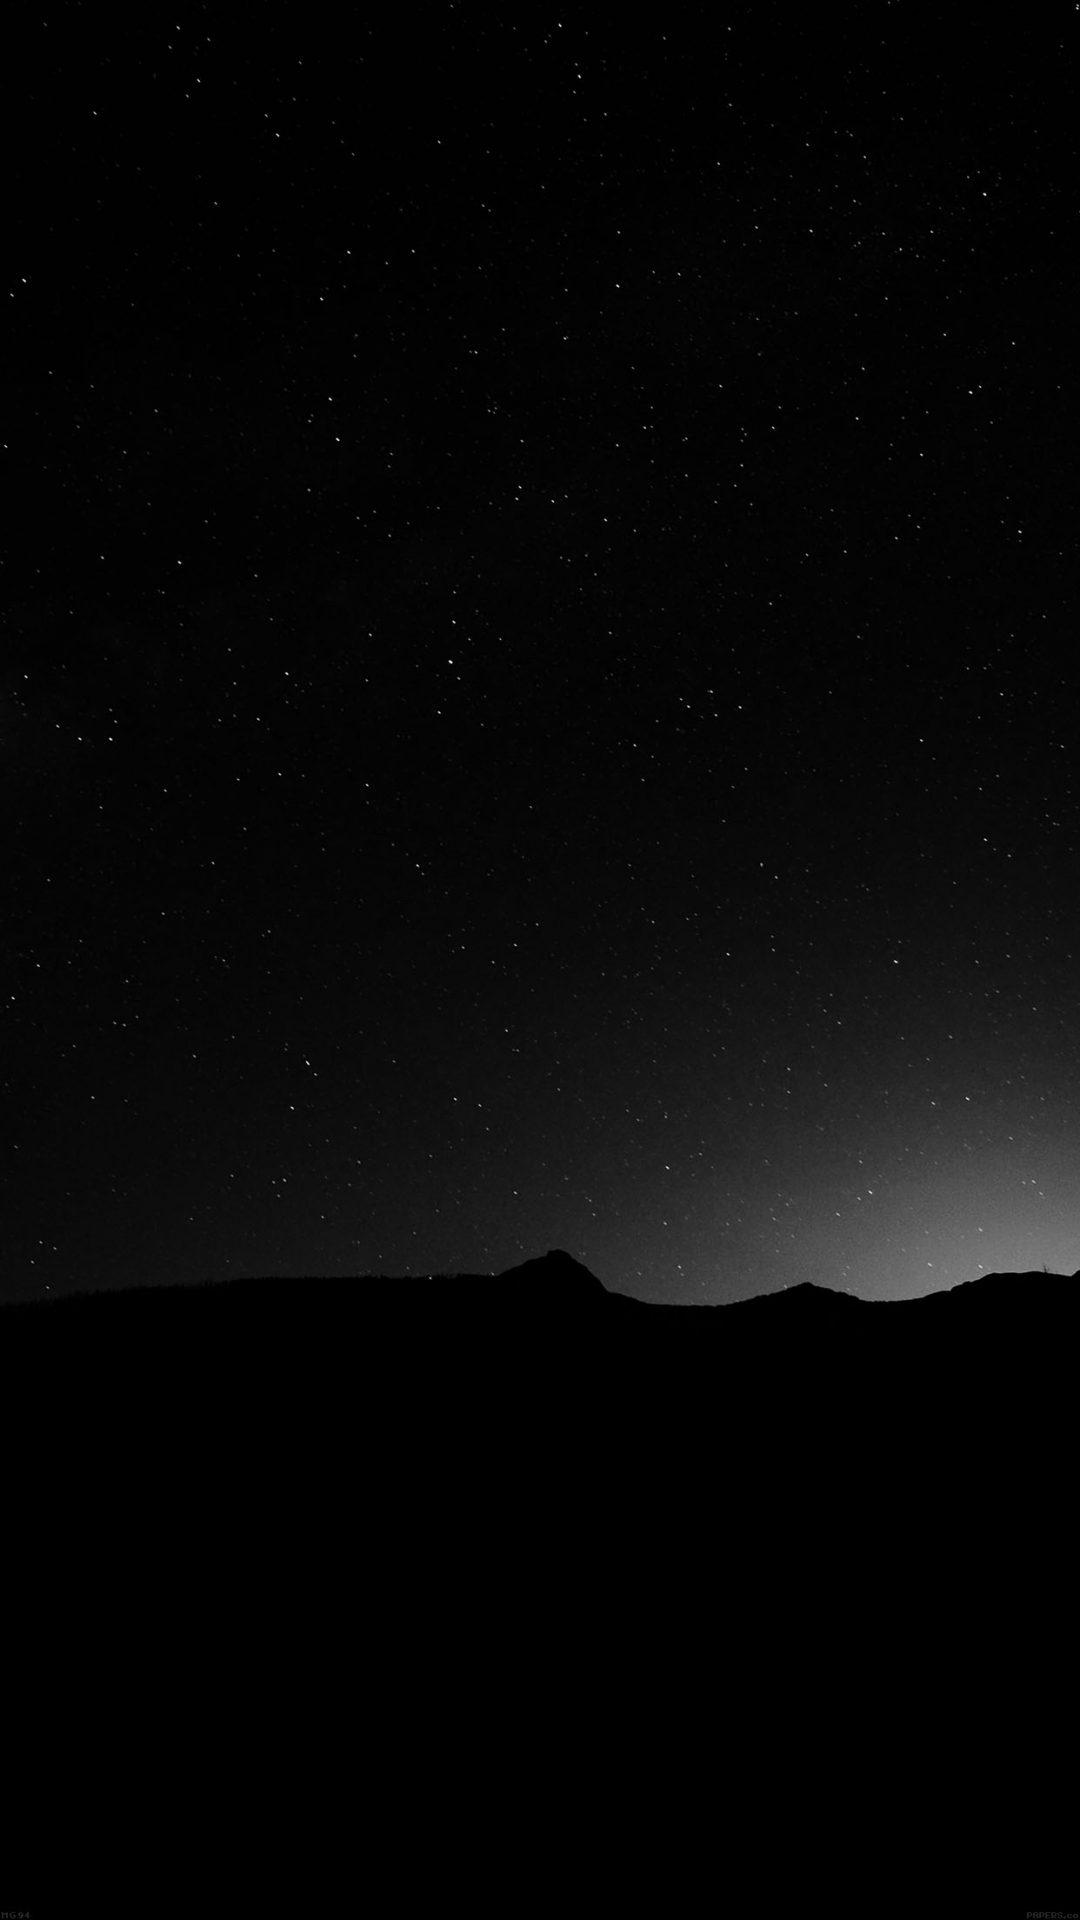 Night Sky Silent Wide Mountain Star Shining Nature